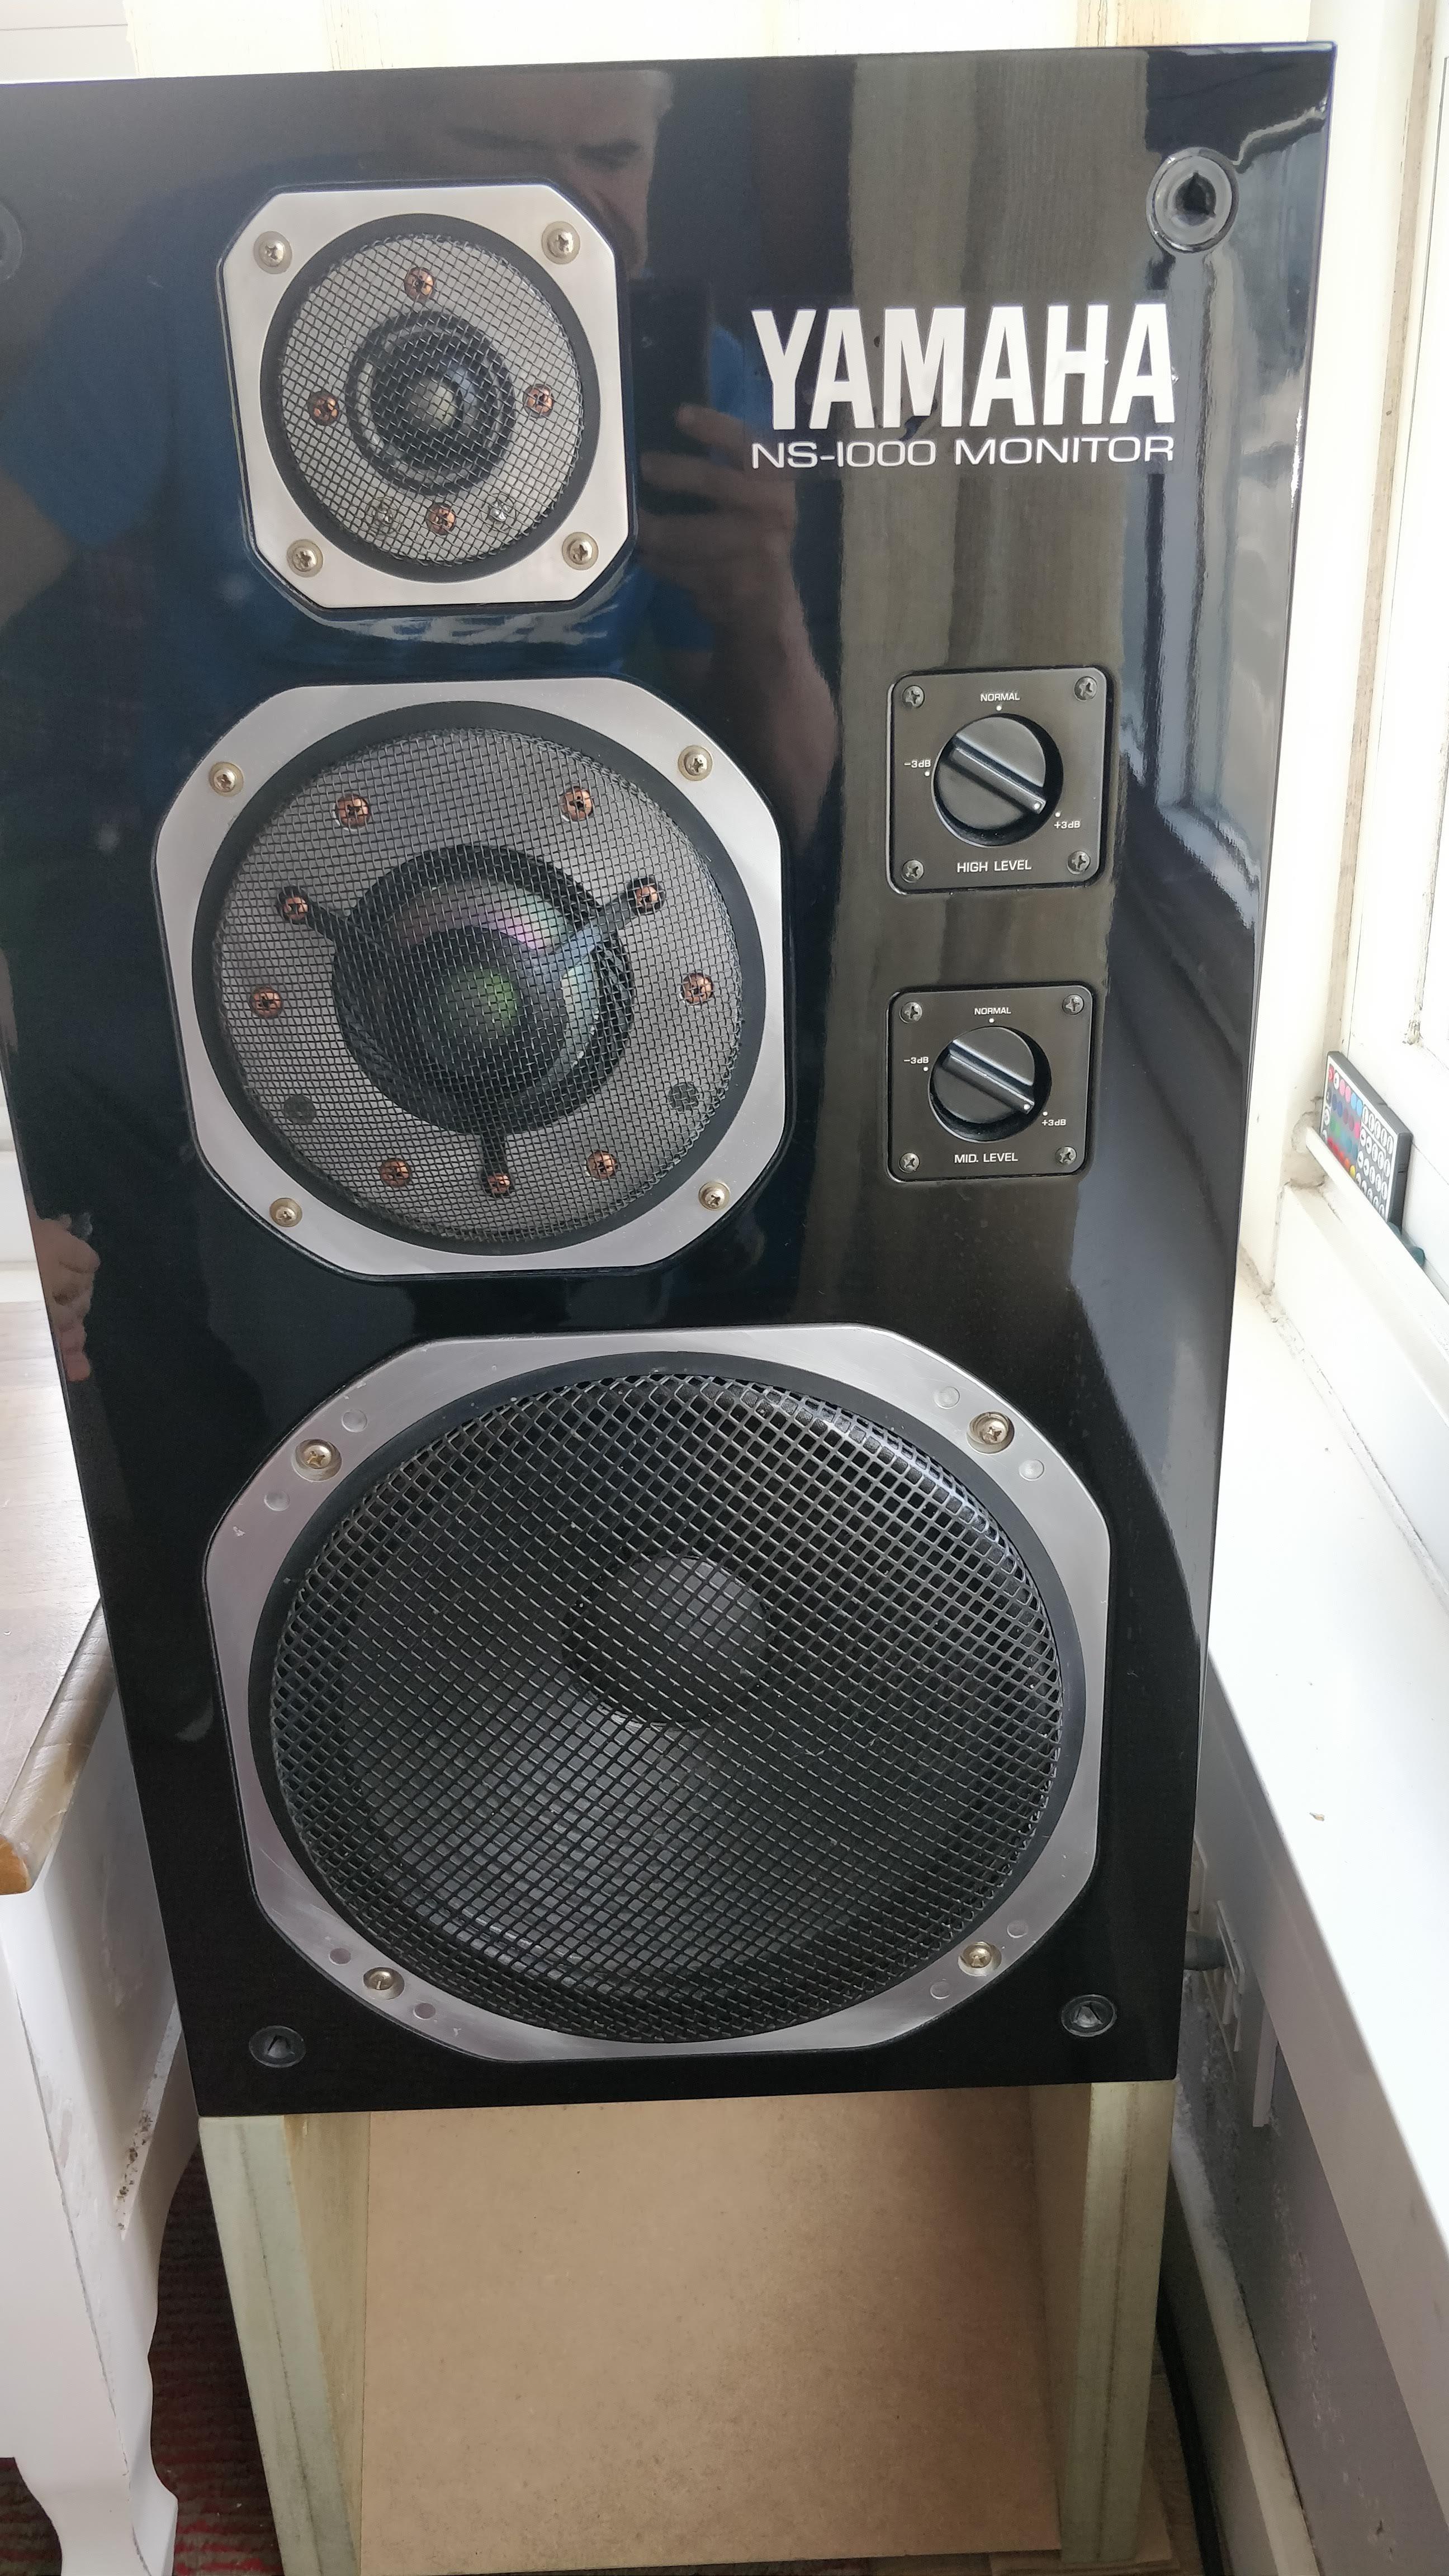 Restauracion Yamaha NS-1000m - Página 2 Klw1aZ5